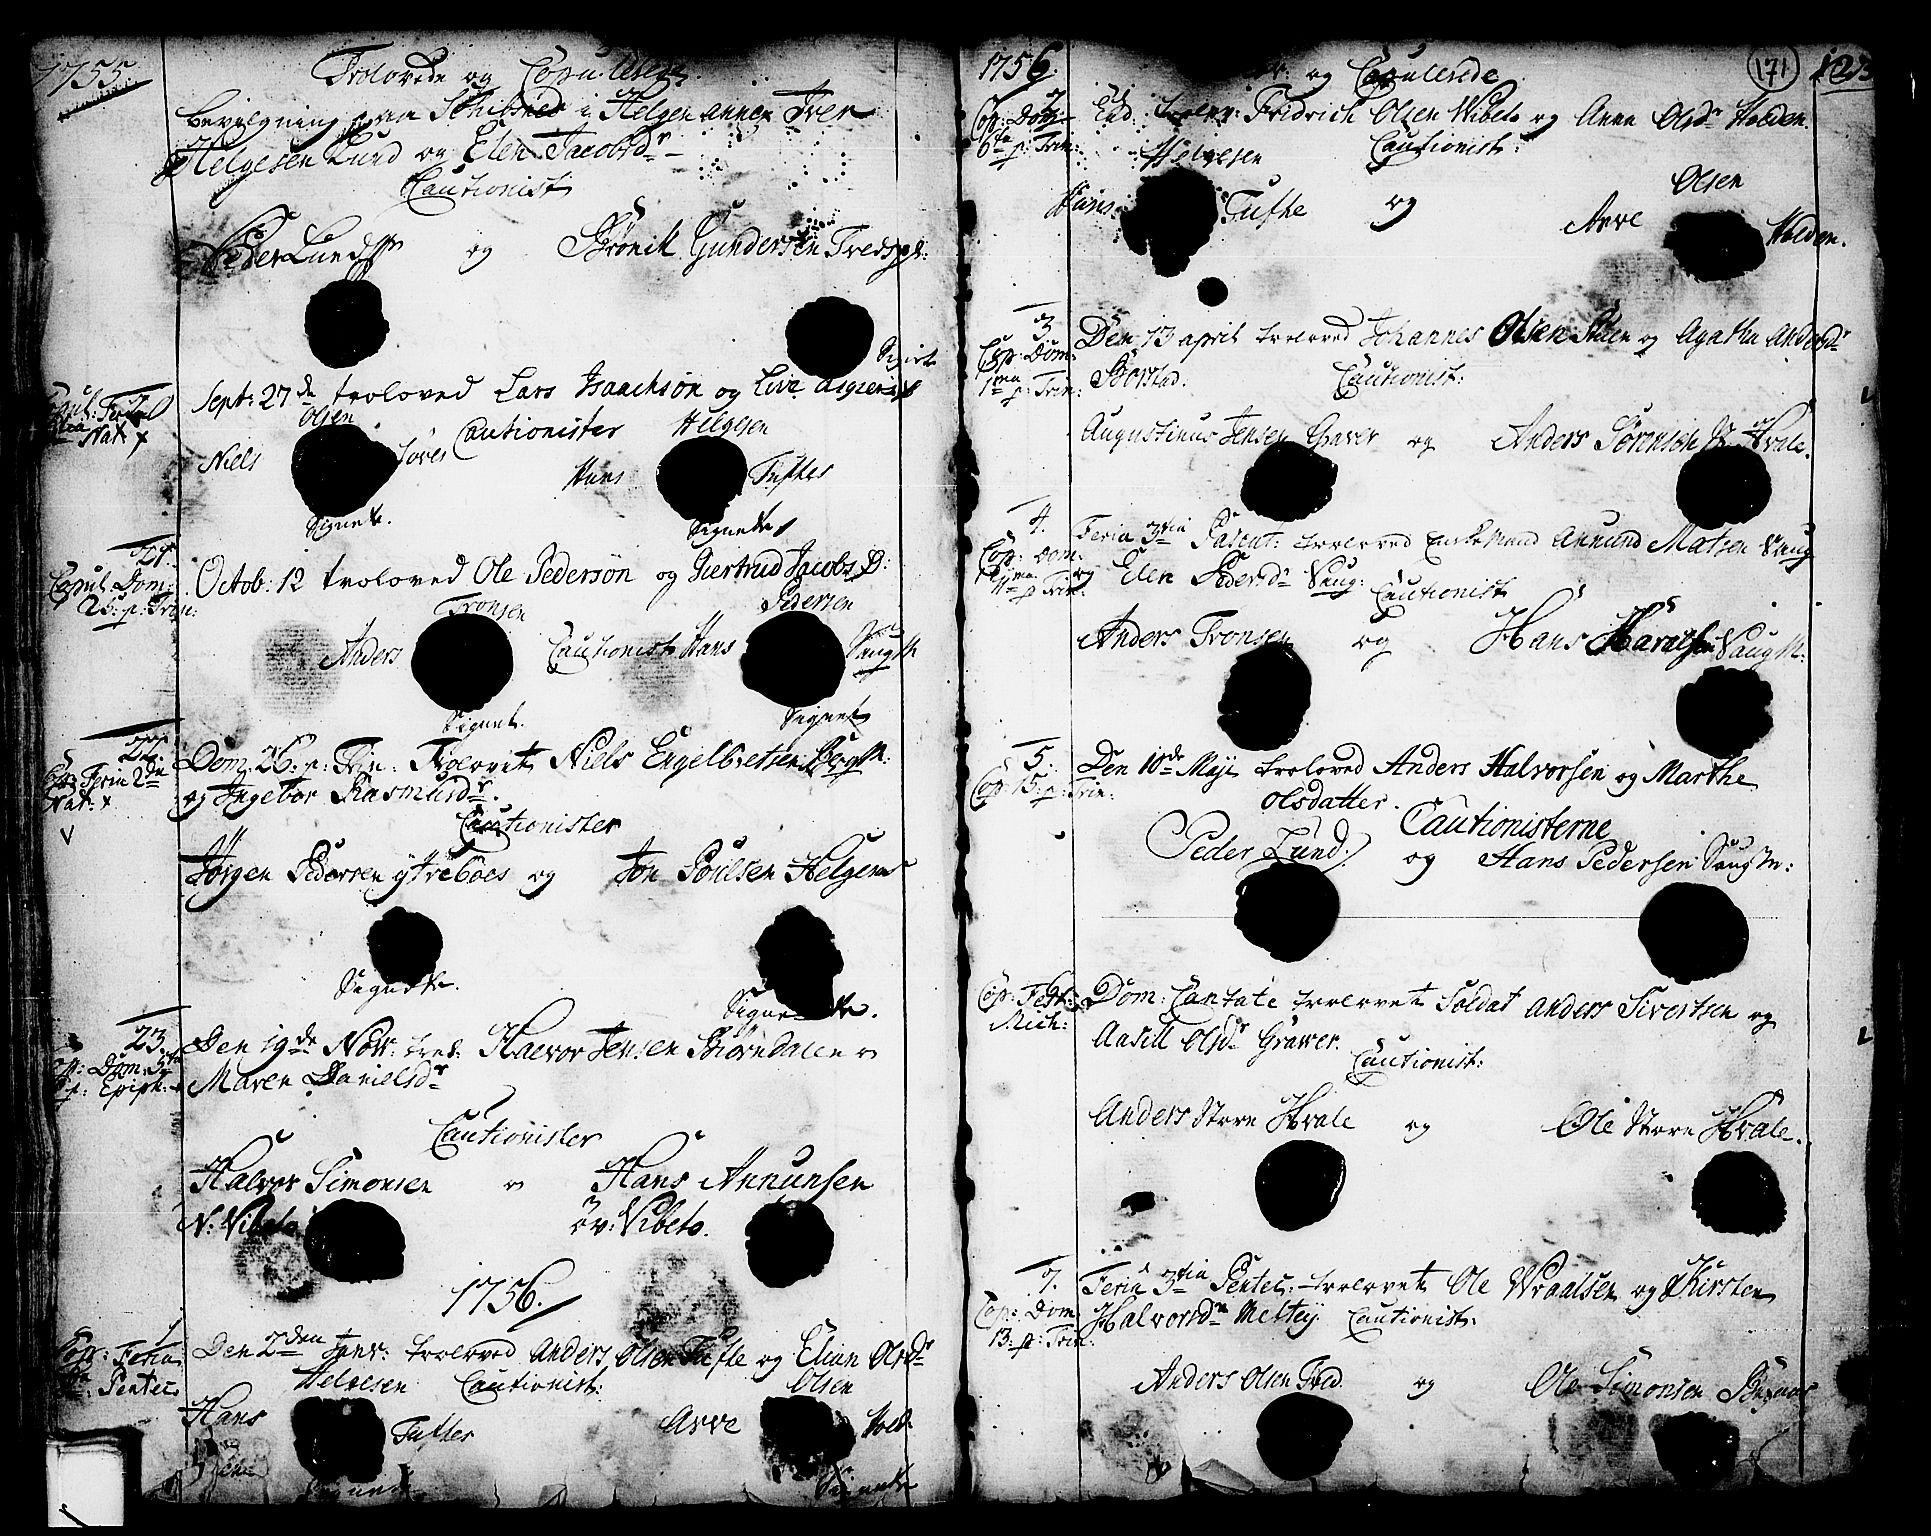 SAKO, Holla kirkebøker, F/Fa/L0001: Ministerialbok nr. 1, 1717-1779, s. 171